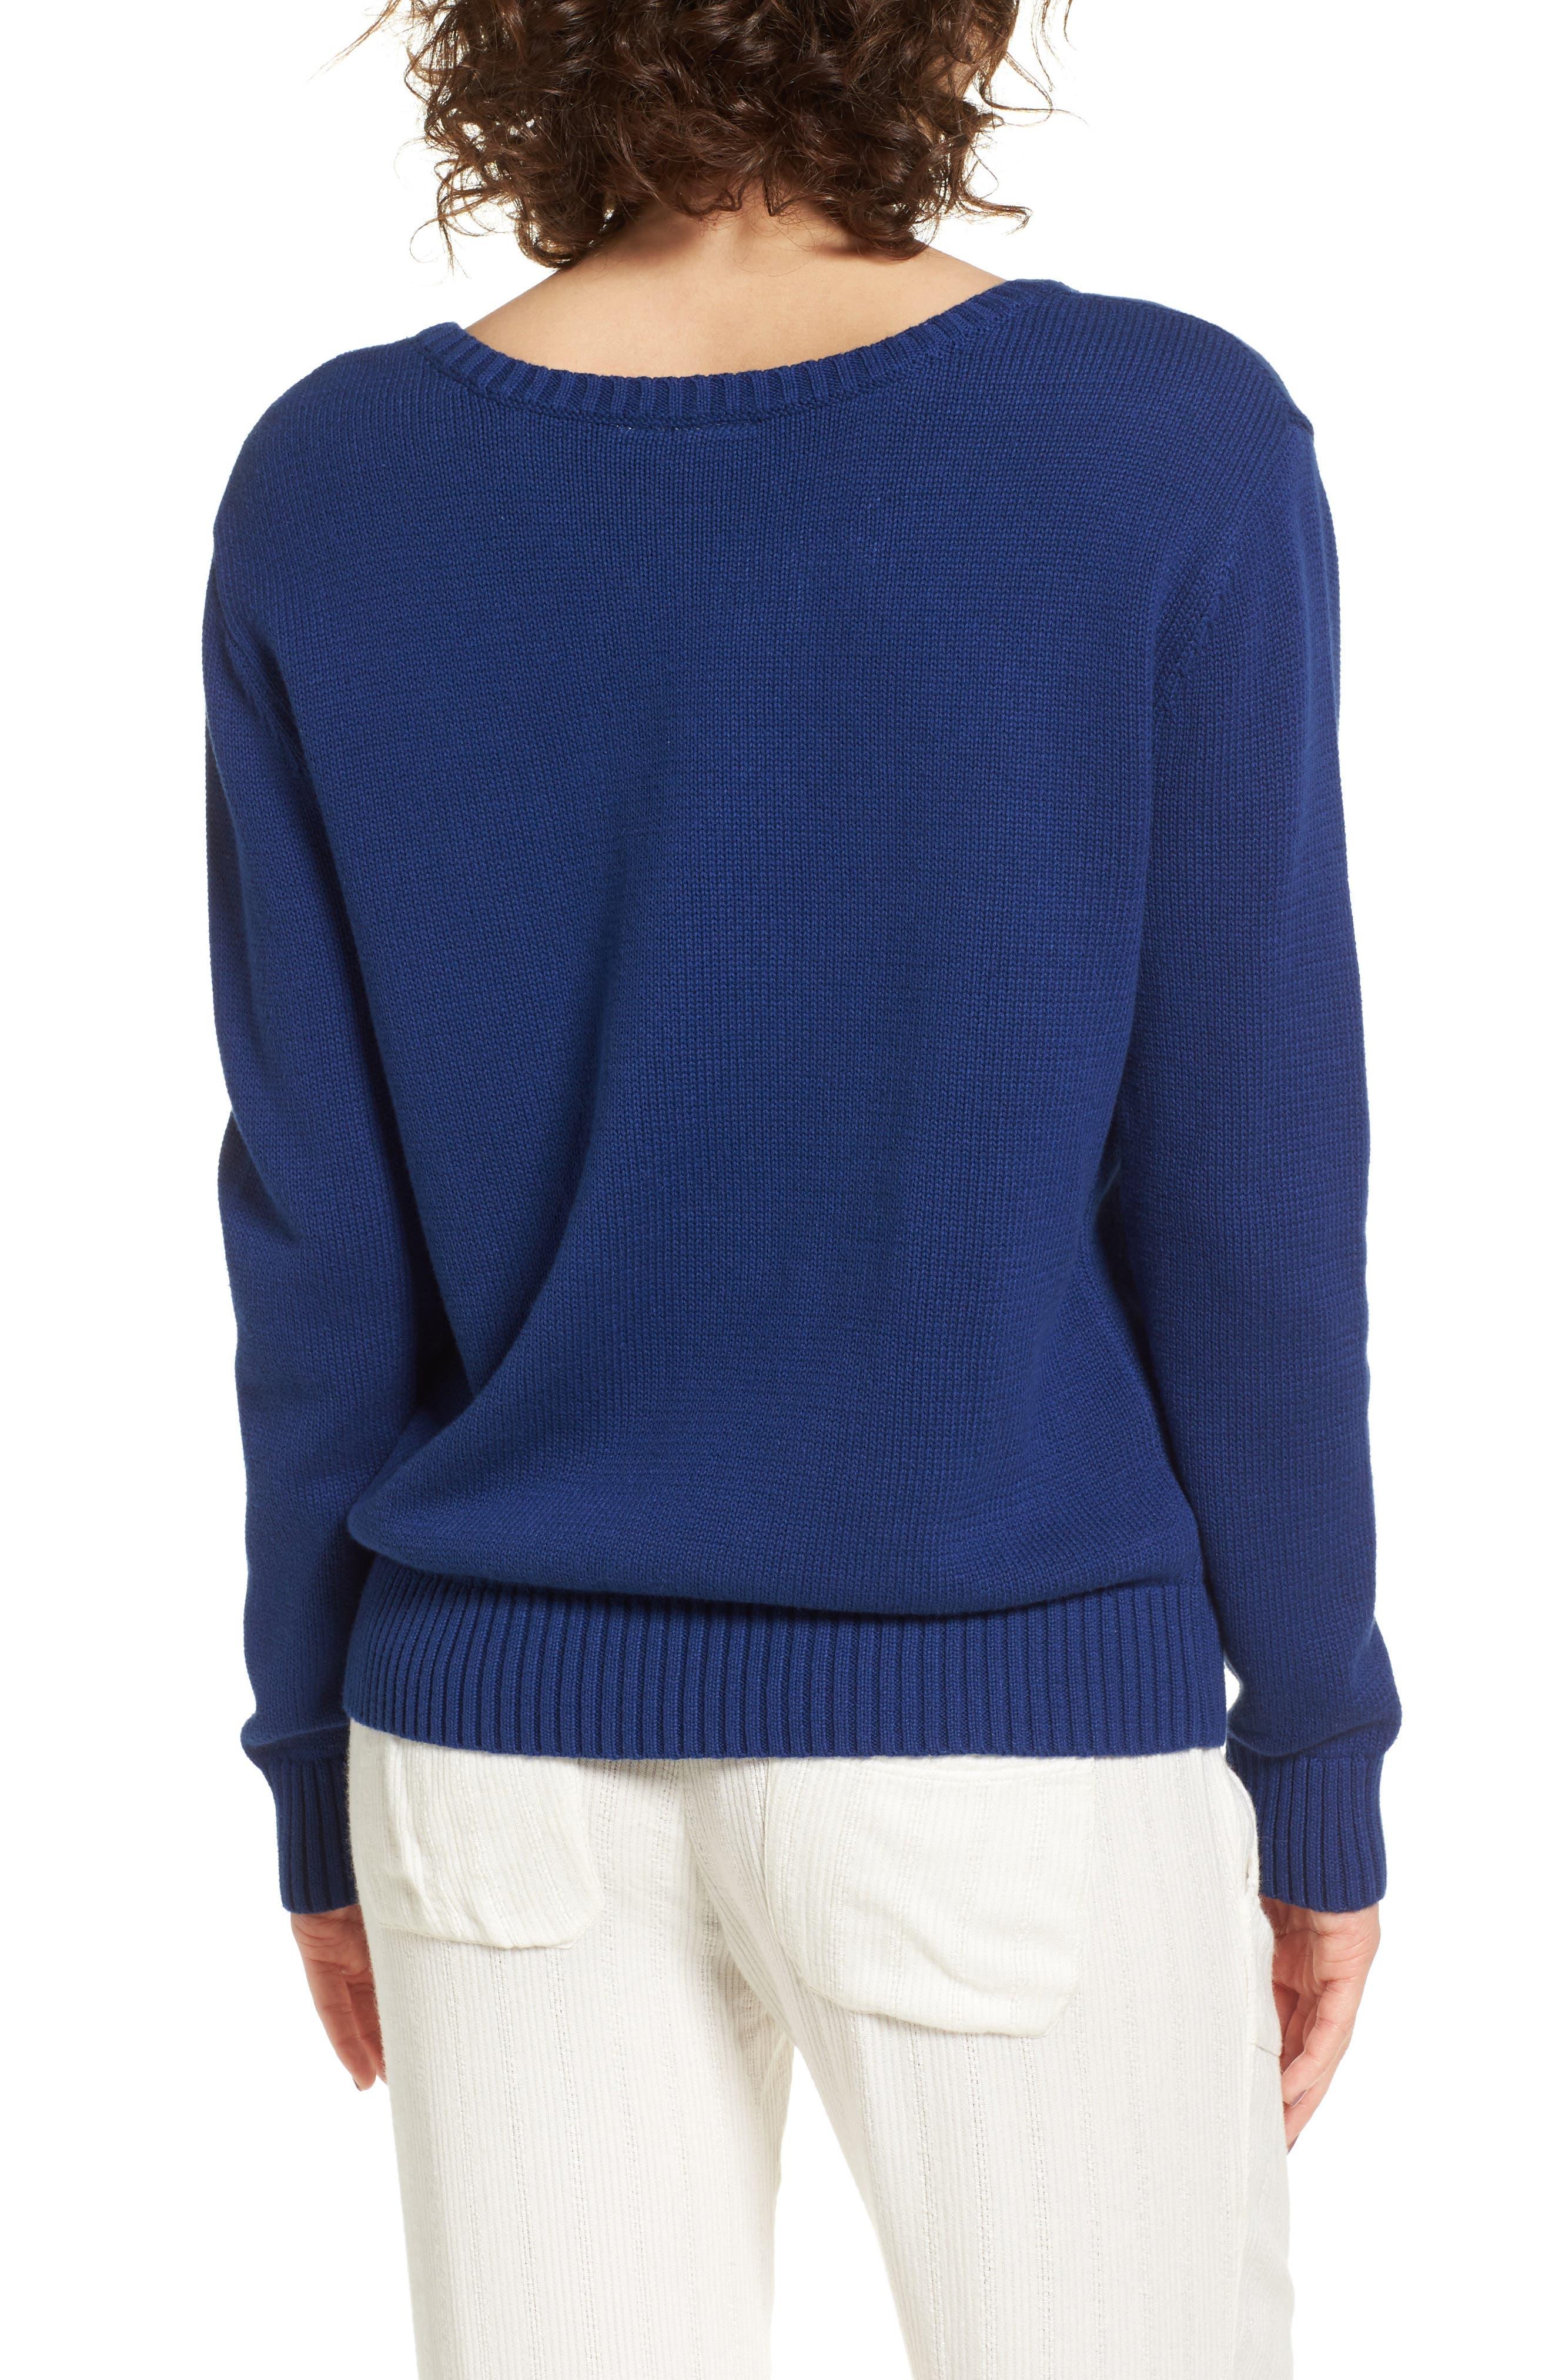 Alternate Image 2  - Roxy Higher Ground Graphic Sweater